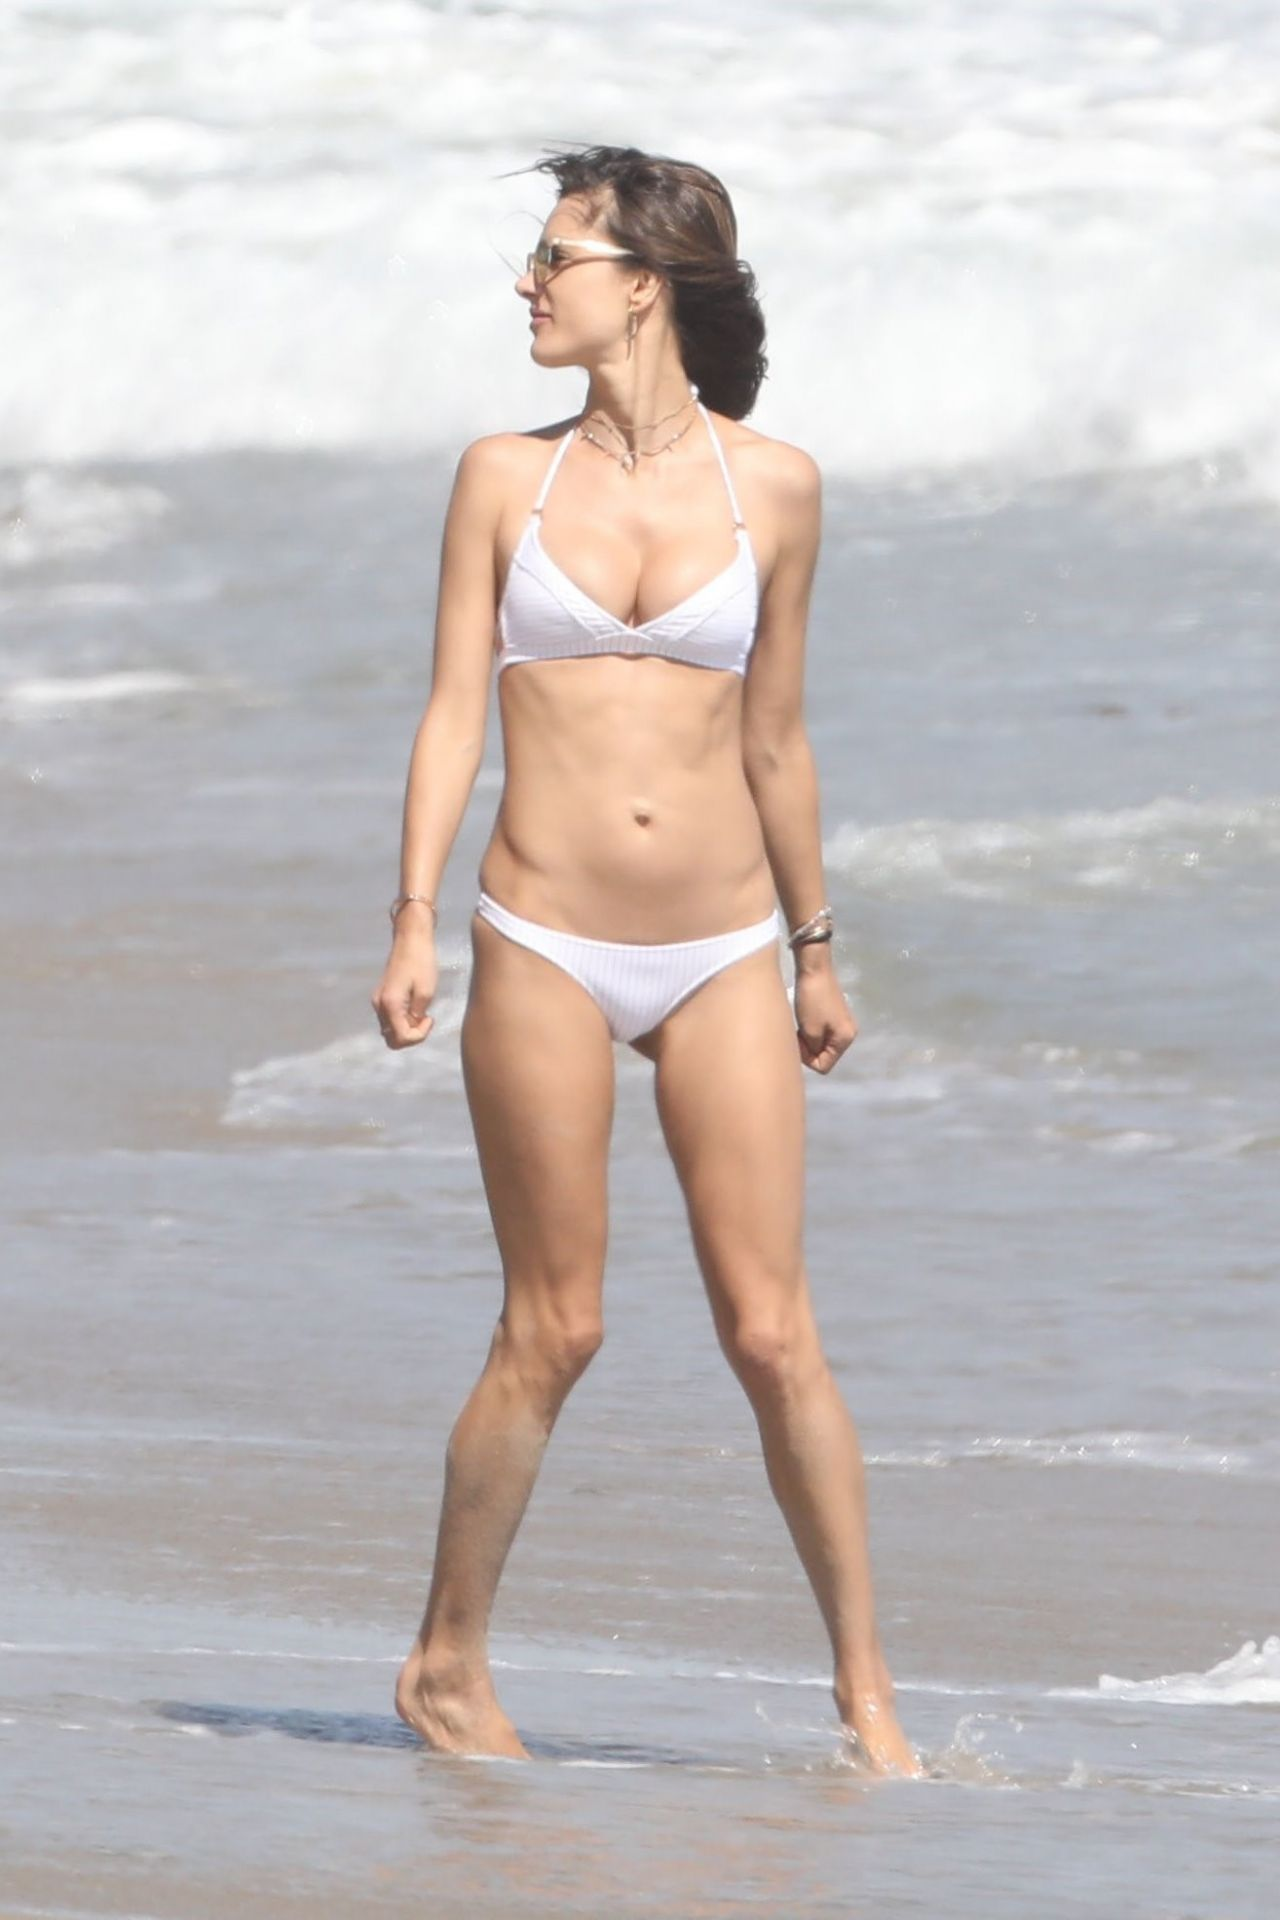 Alessandra Ambrosio Bikini Bodies Pic 6 of 35